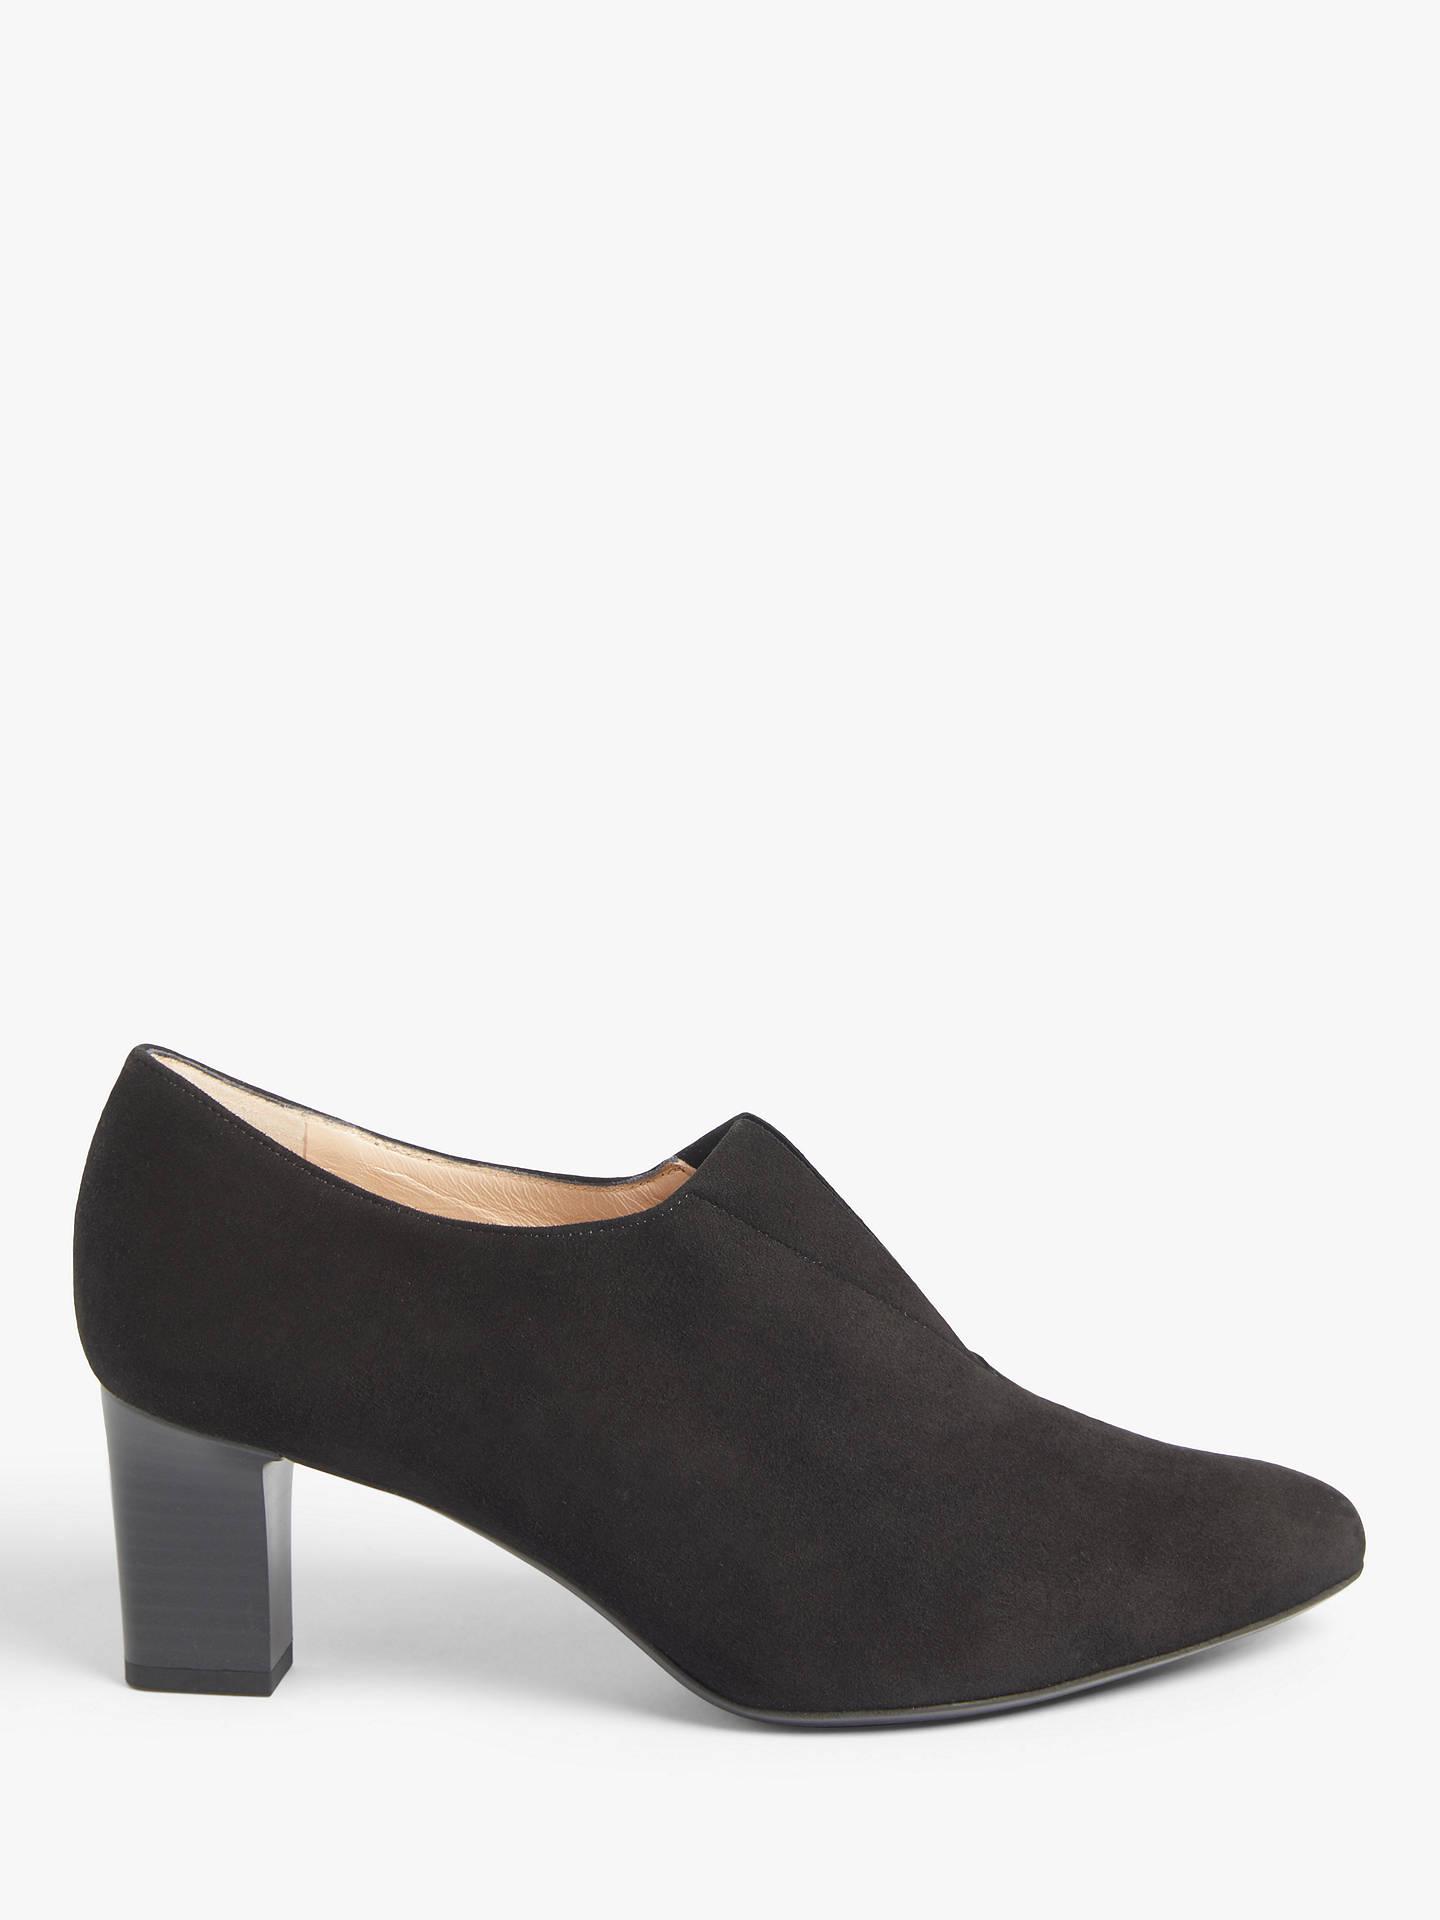 22eccb96ef02 Buy Peter Kaiser Miaka Block Heel Shoe Boots